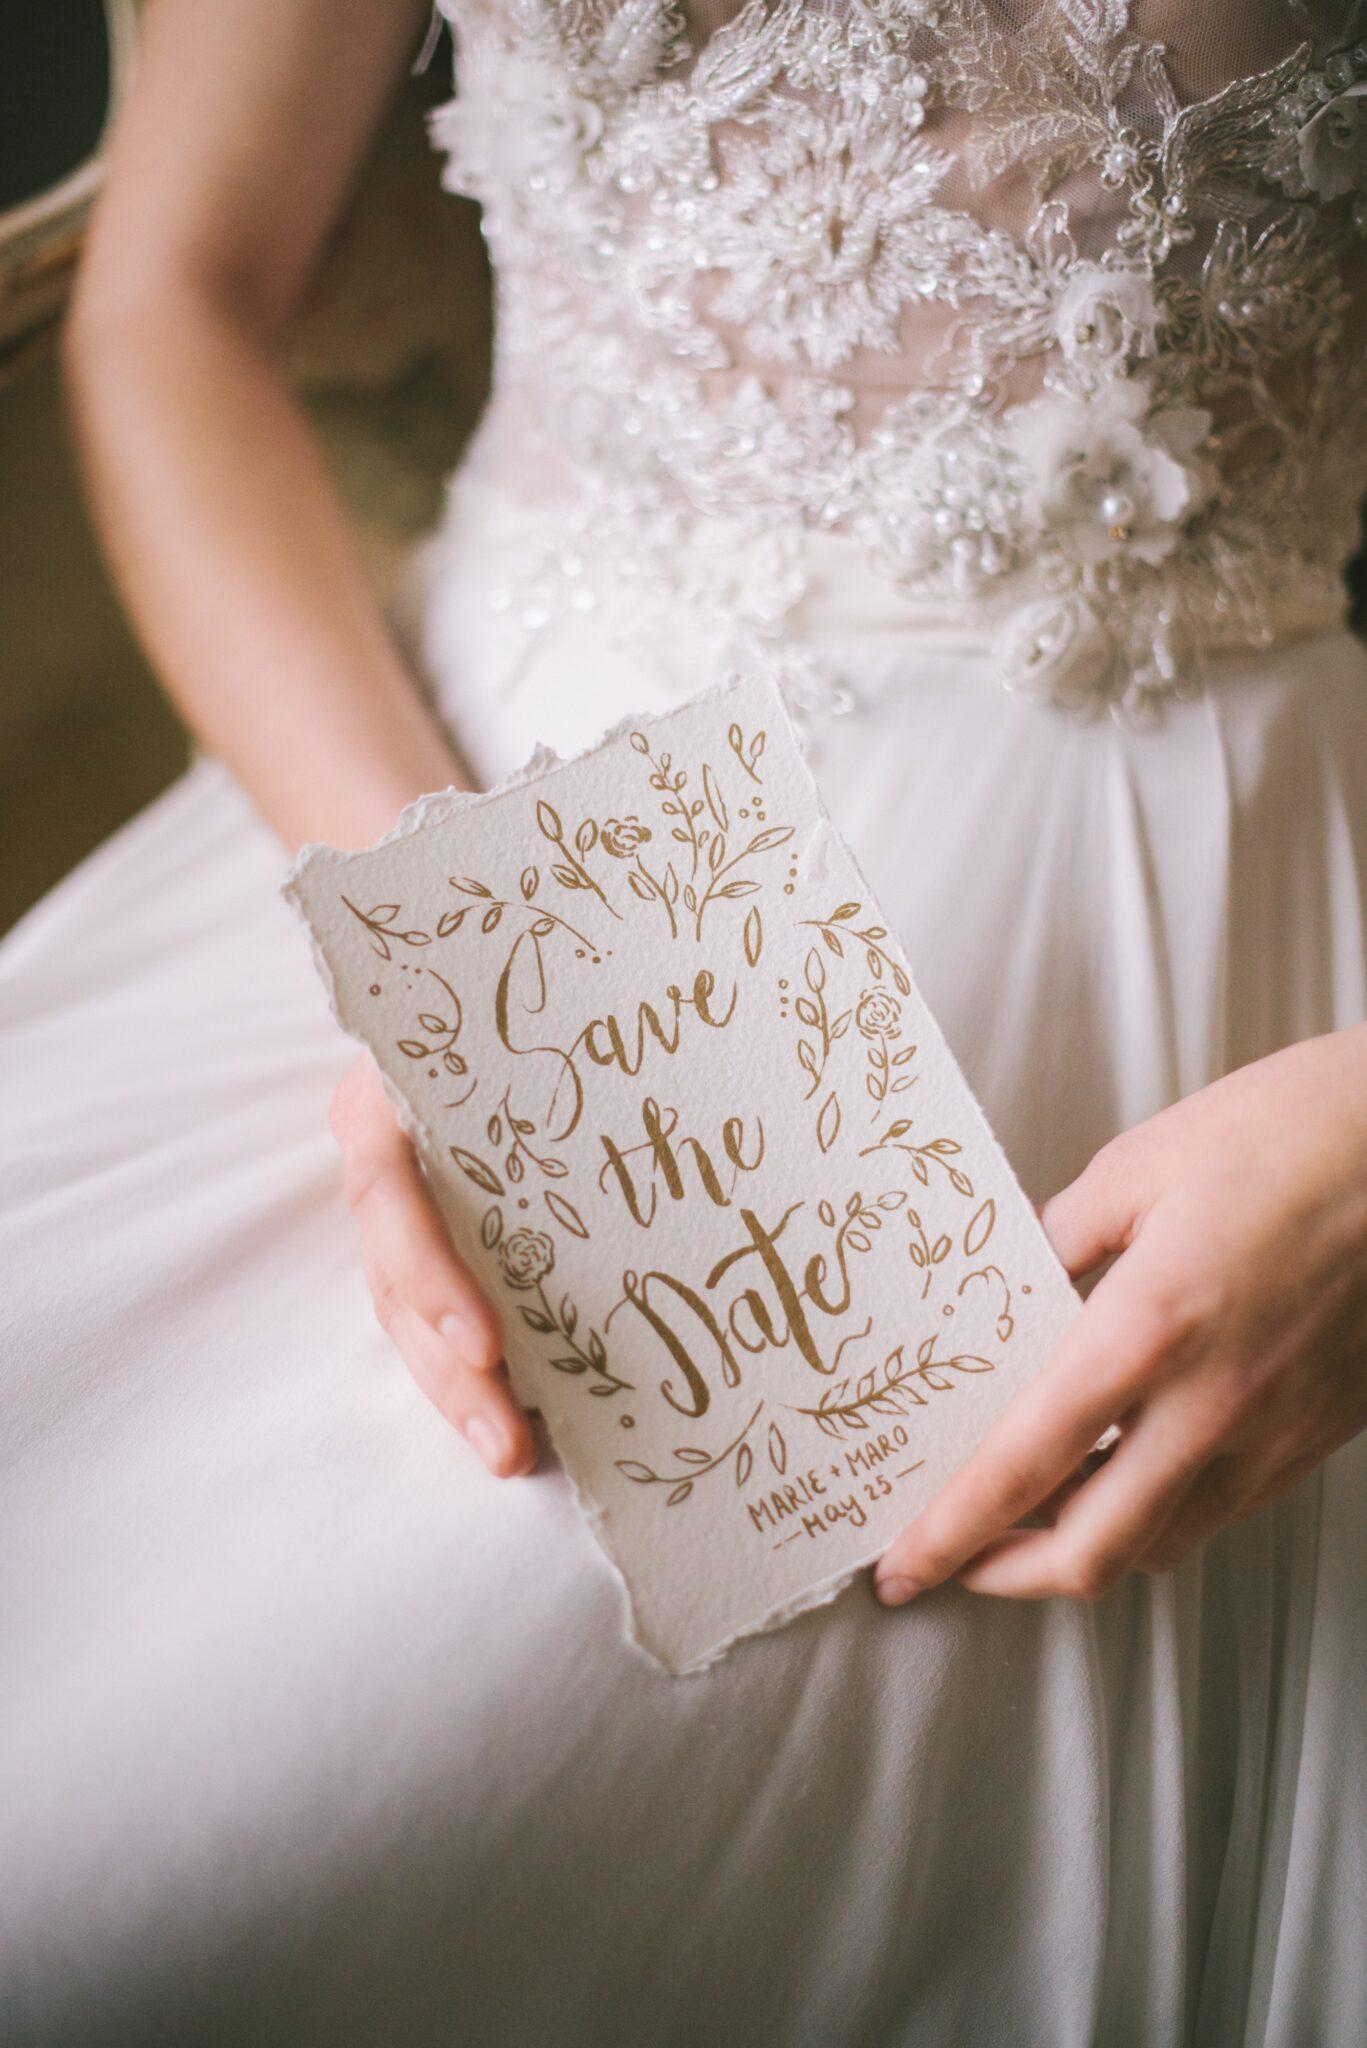 Surprise wedding info